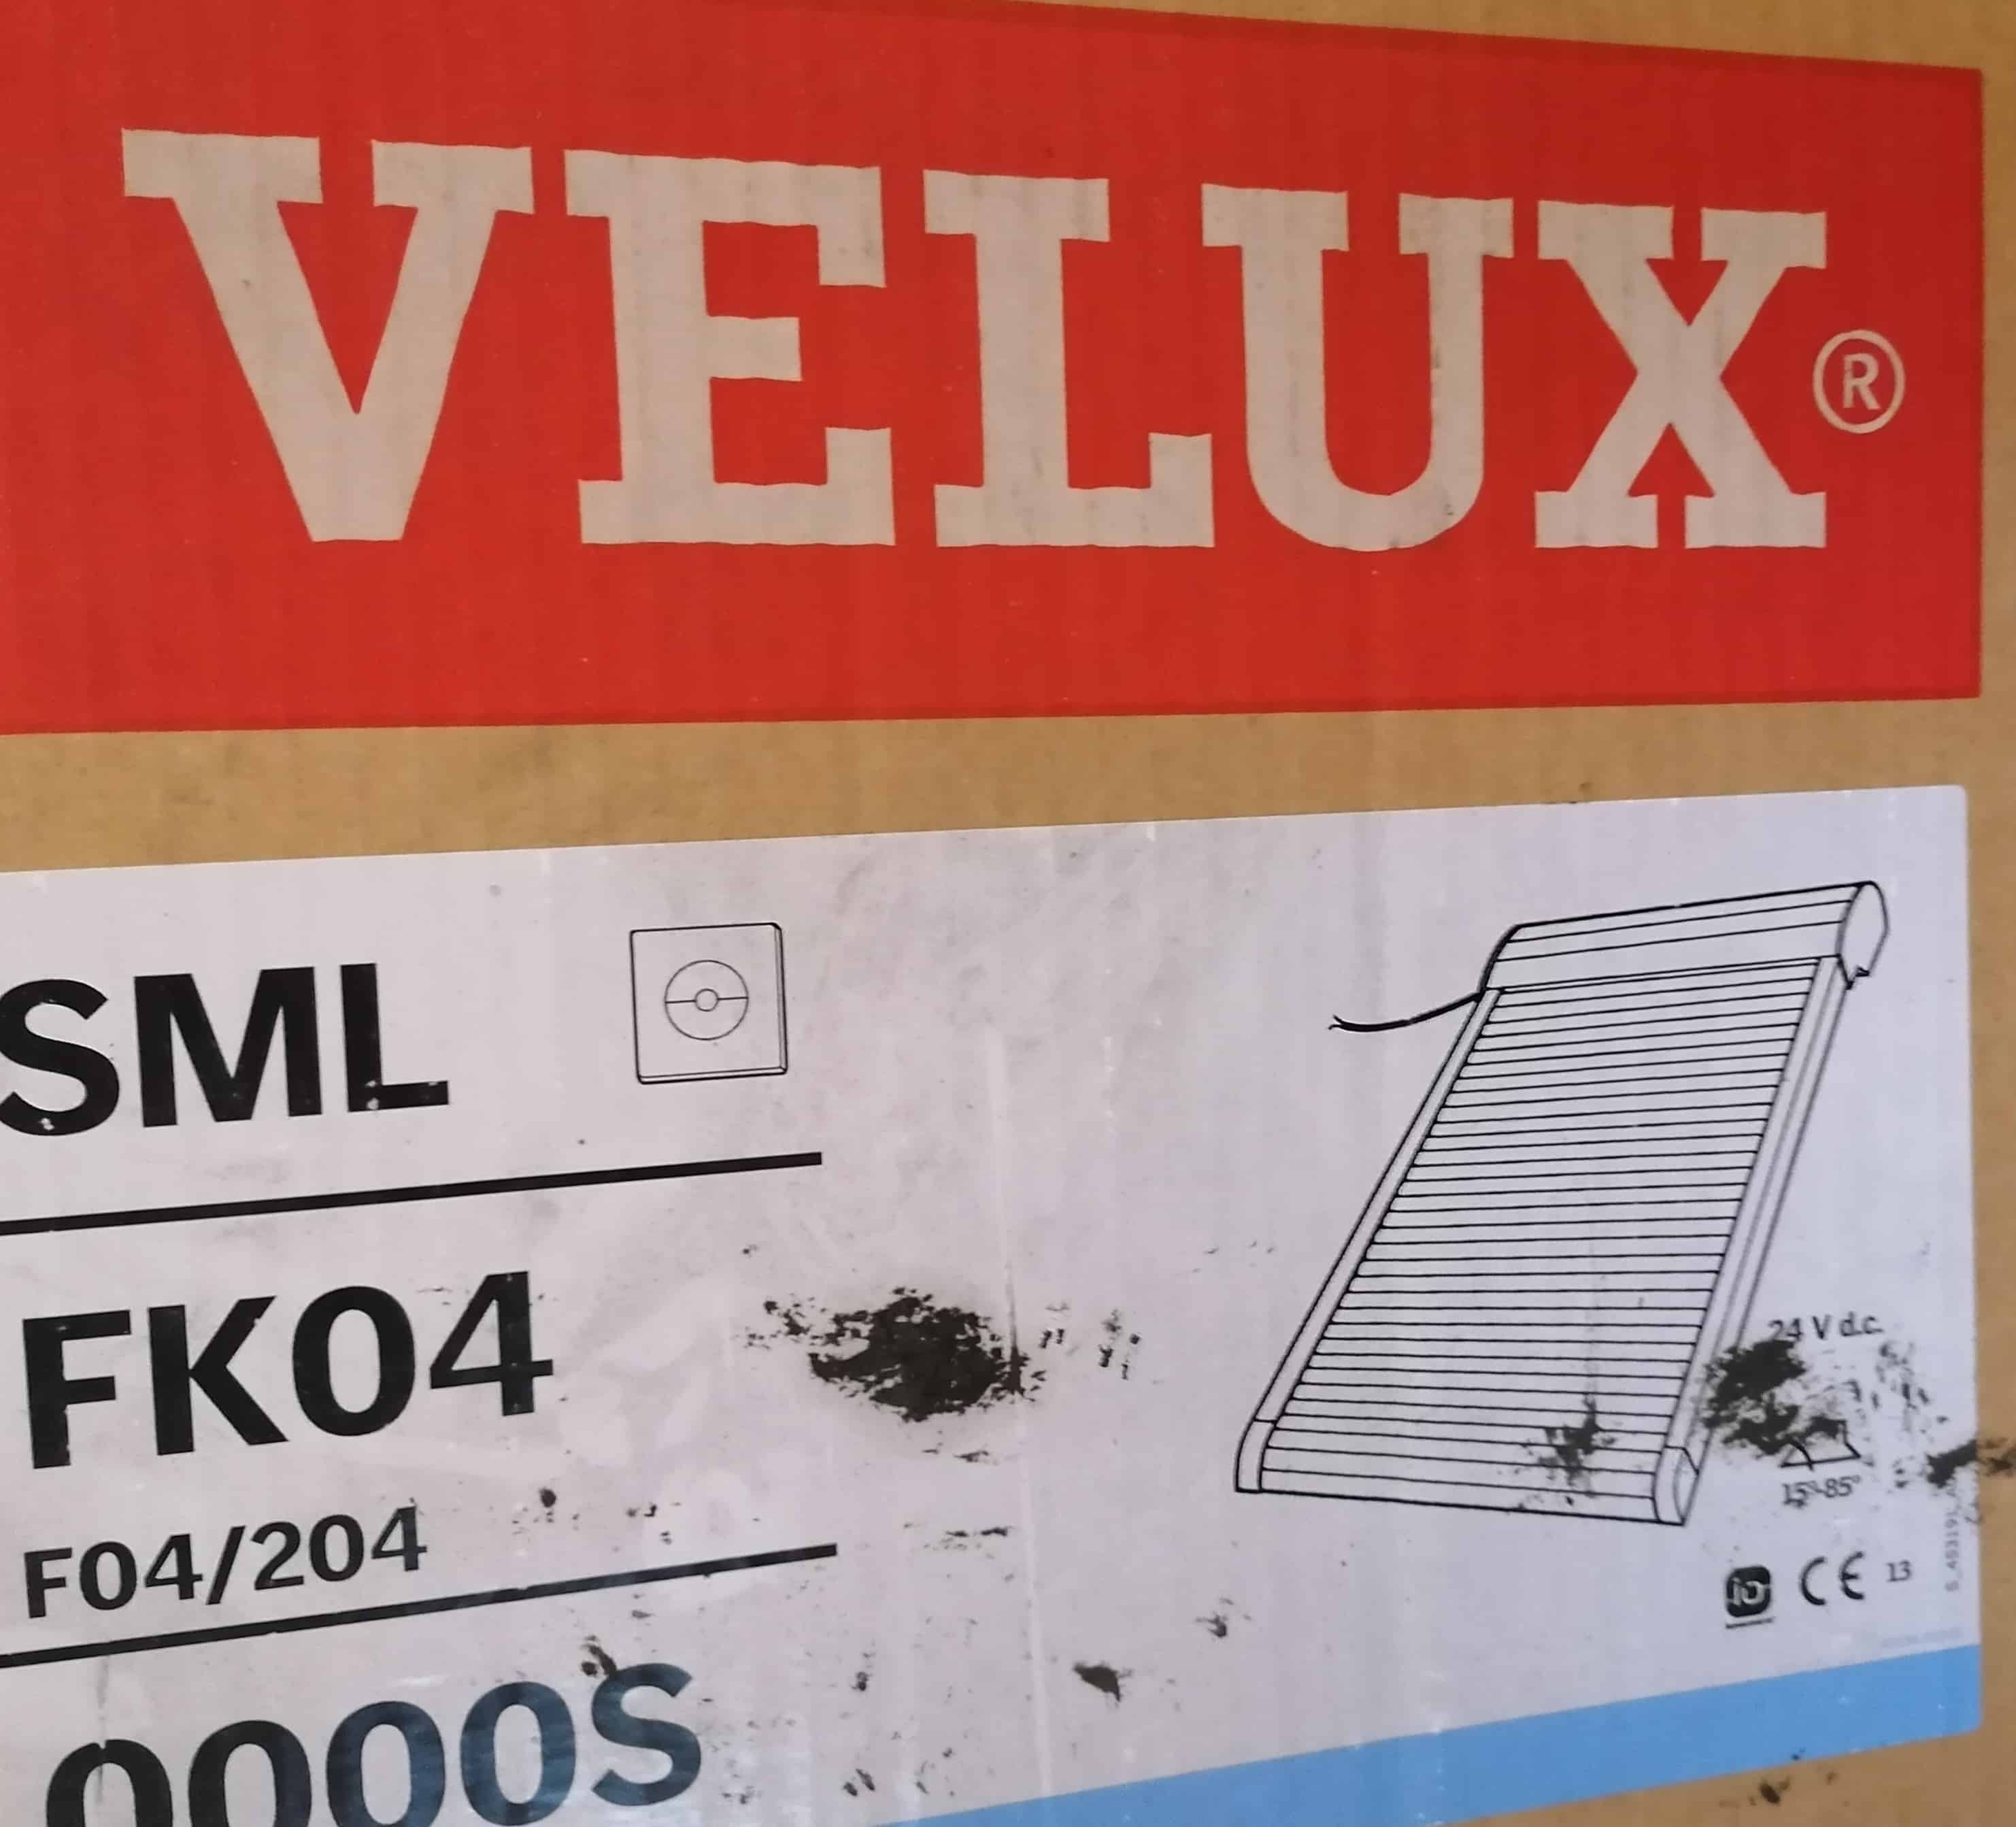 Velux SML FK04 0000S Rollladen Elektro, dunkelgrau, ALU 66 x 98cm